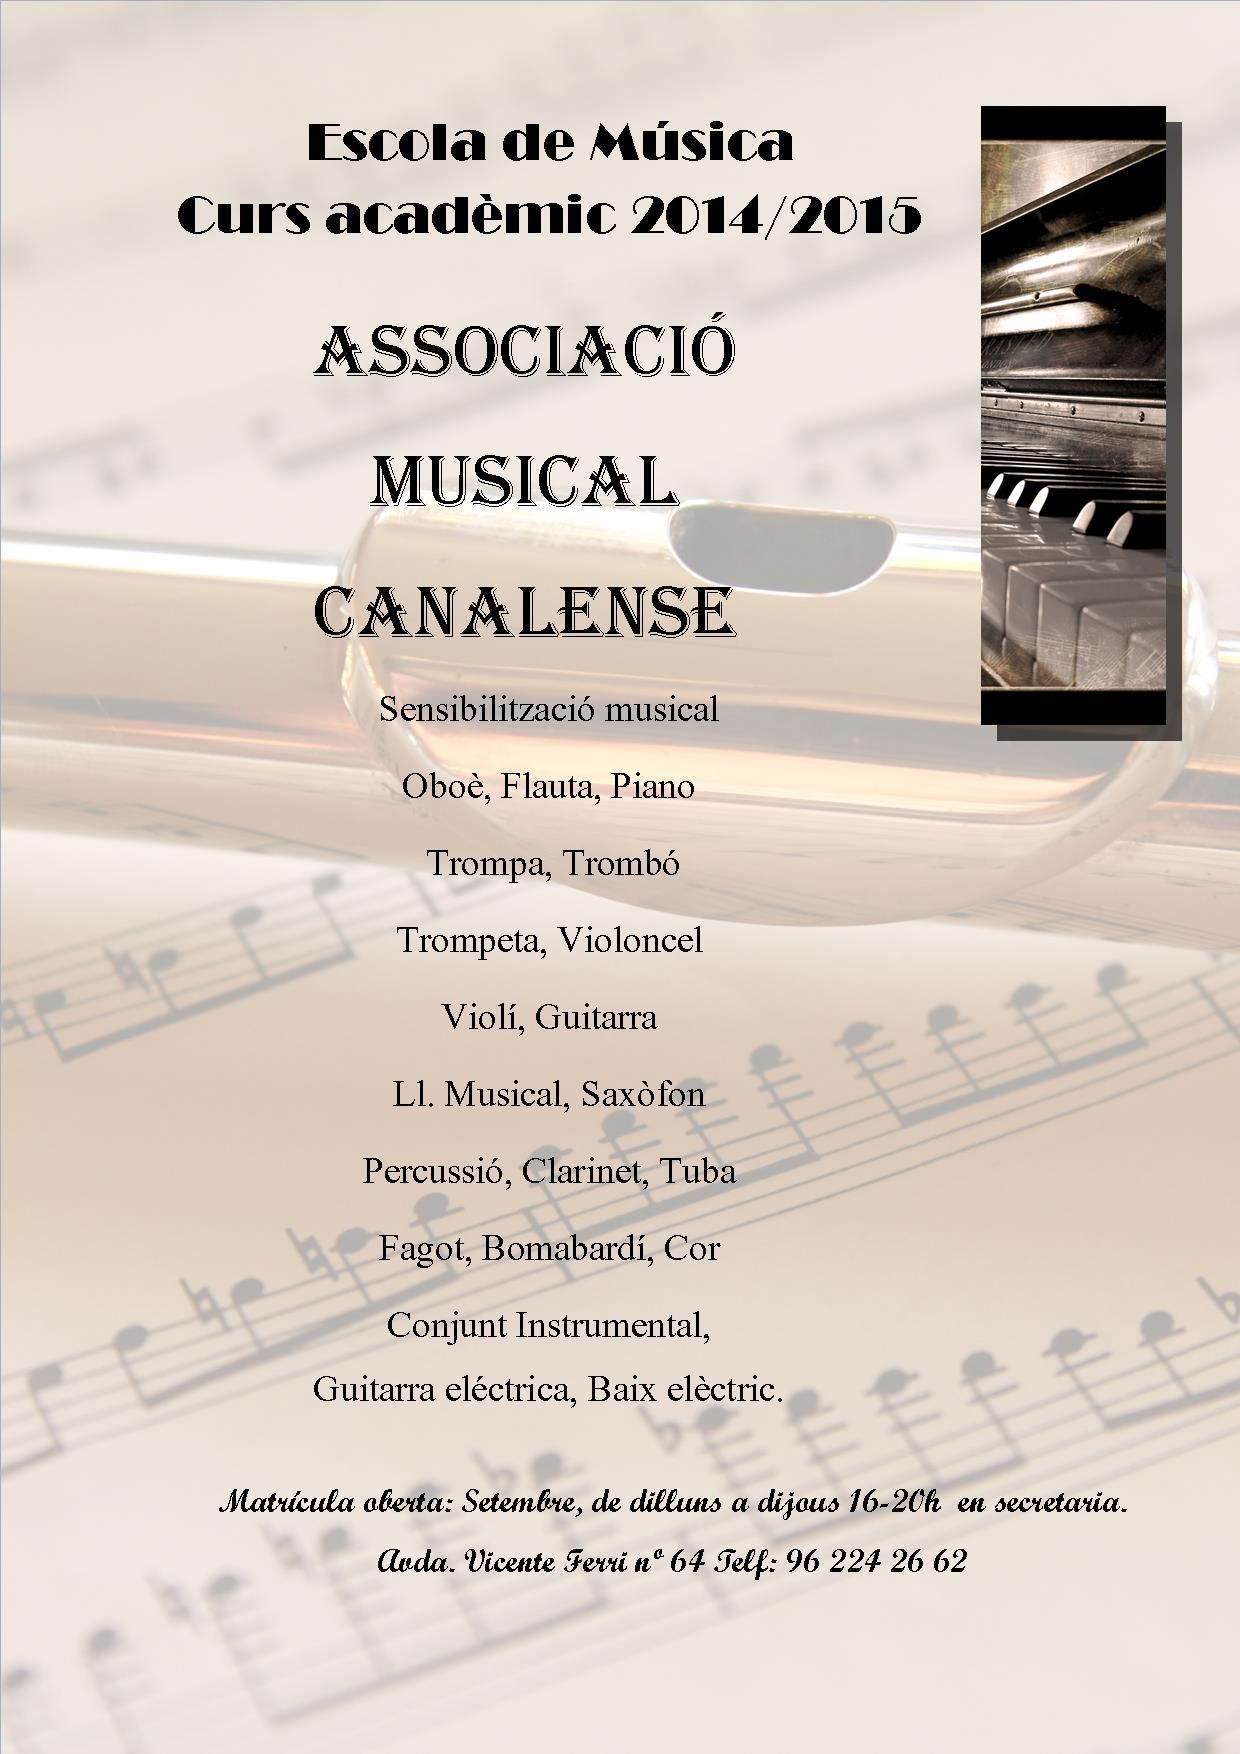 cartell escola de música 2015